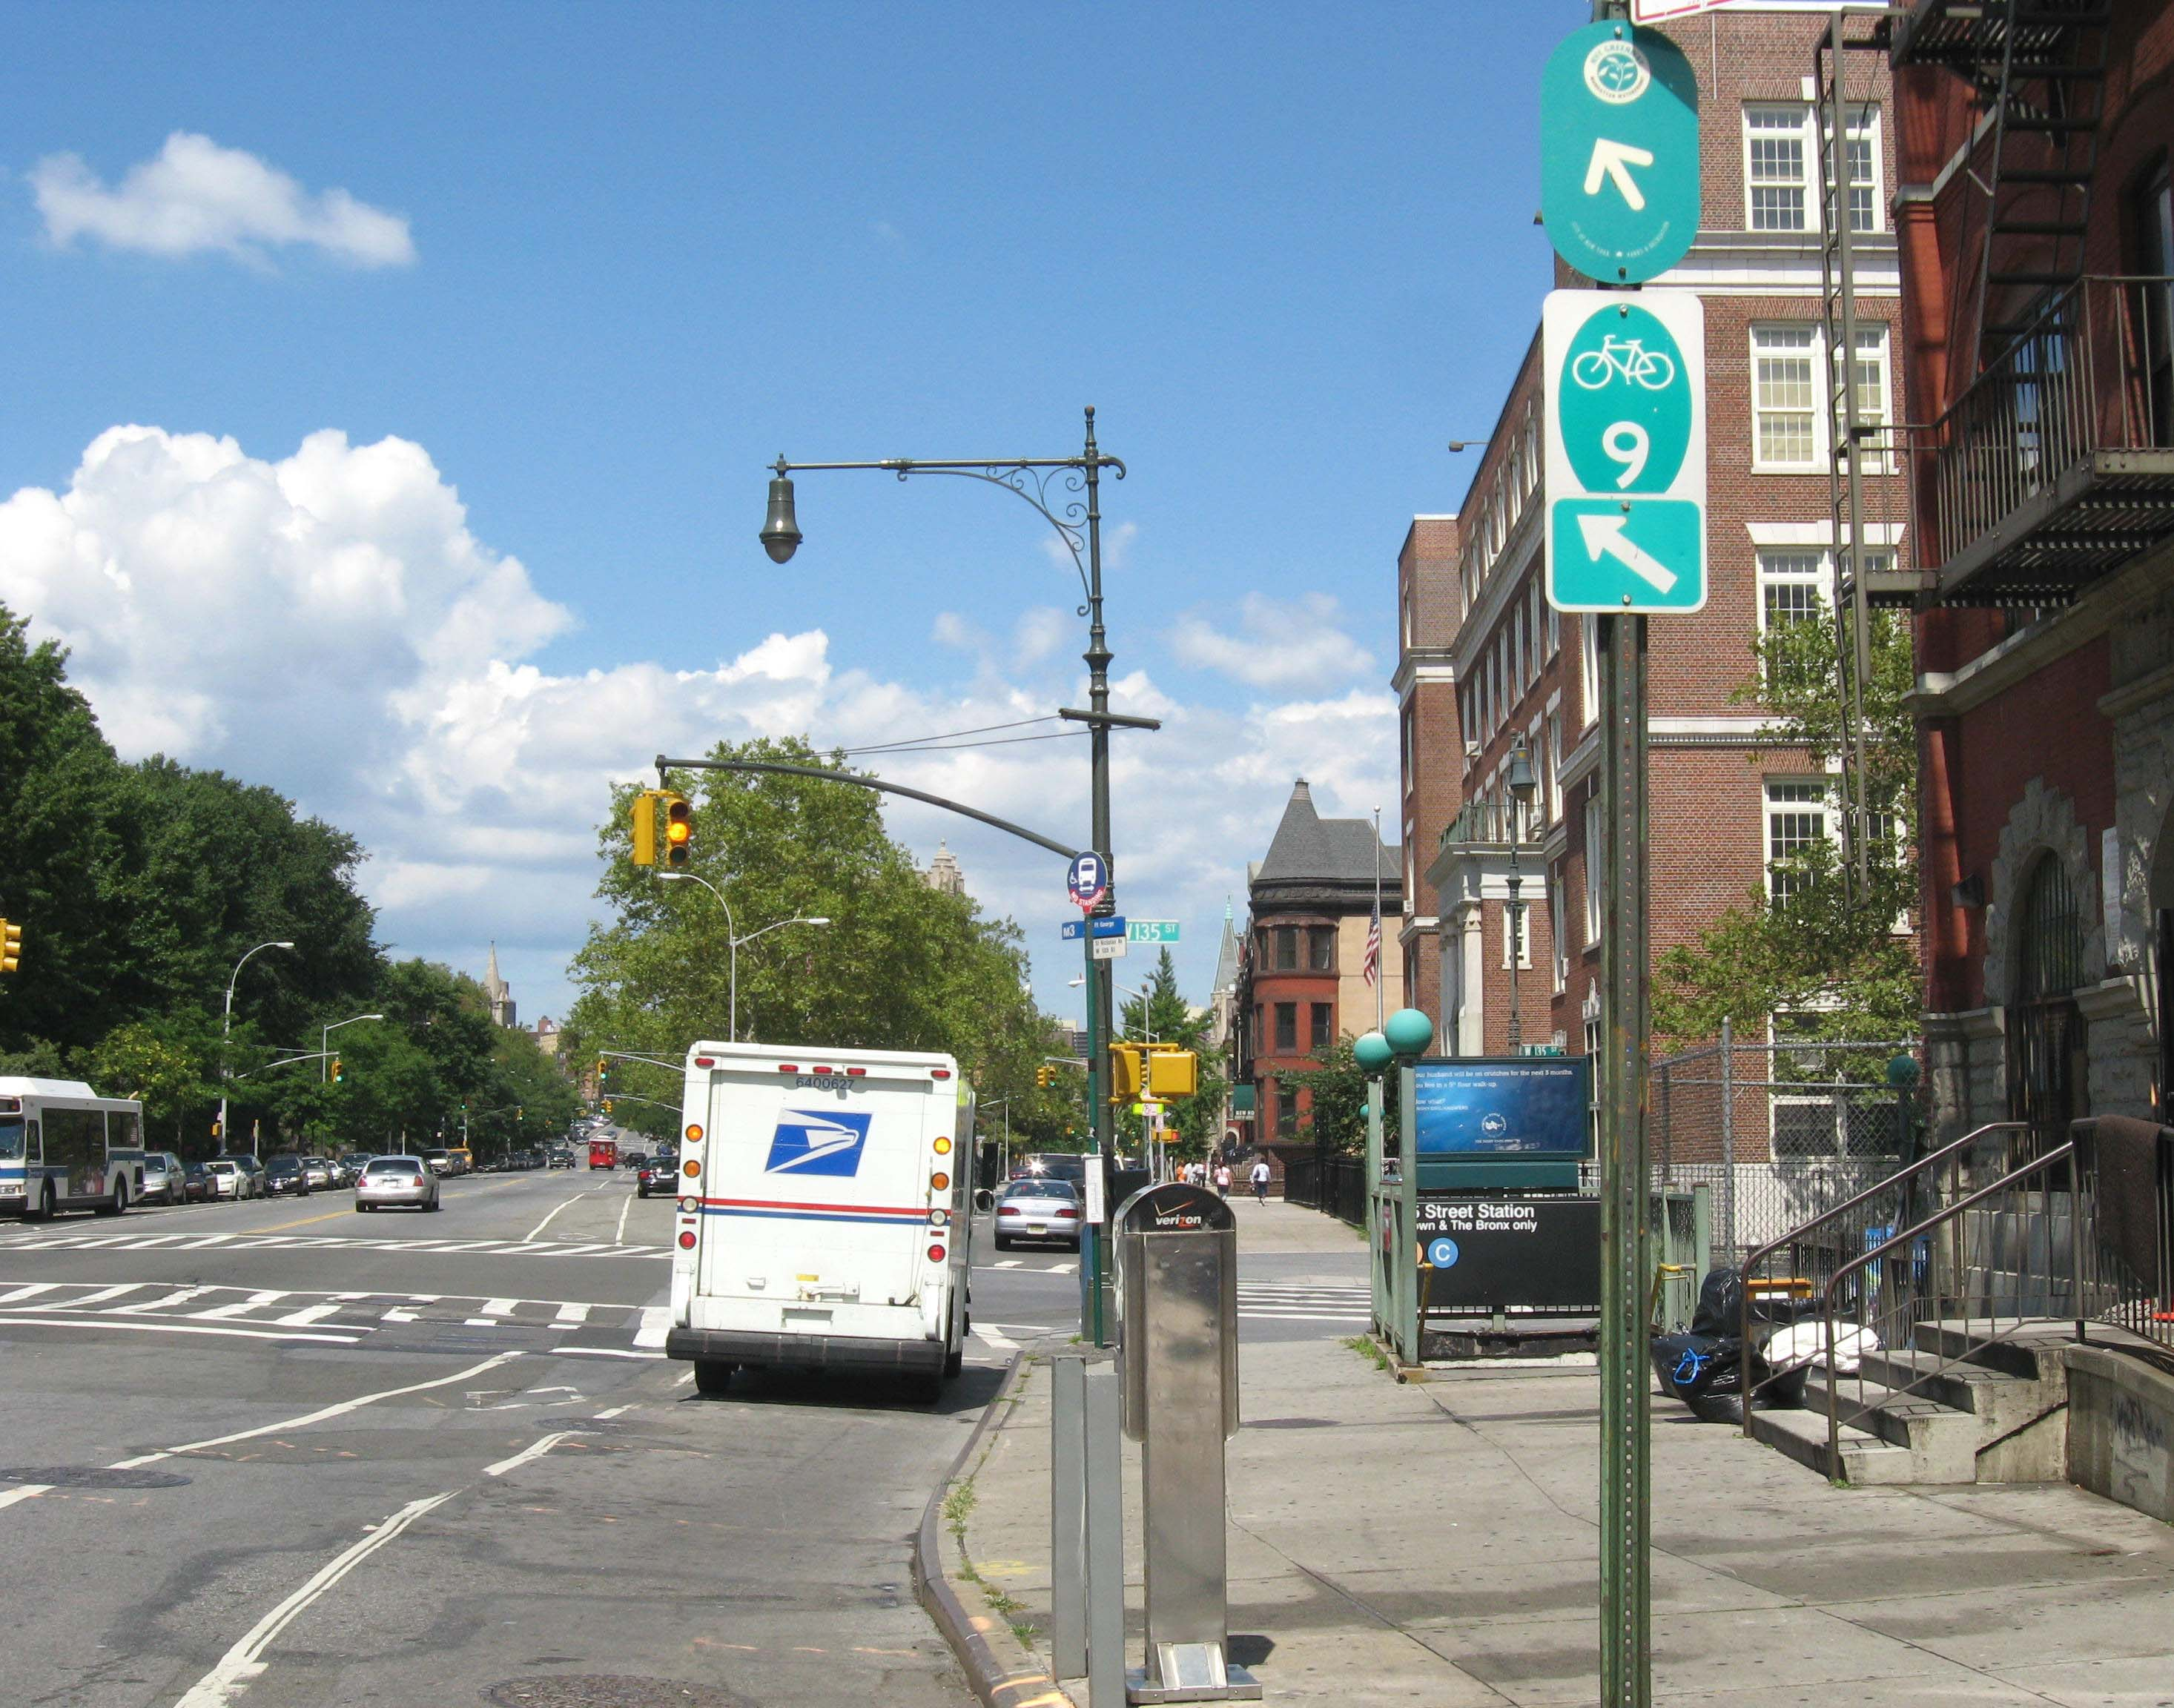 1306 St Nicholas Avenue New York: St. Nicholas Avenue